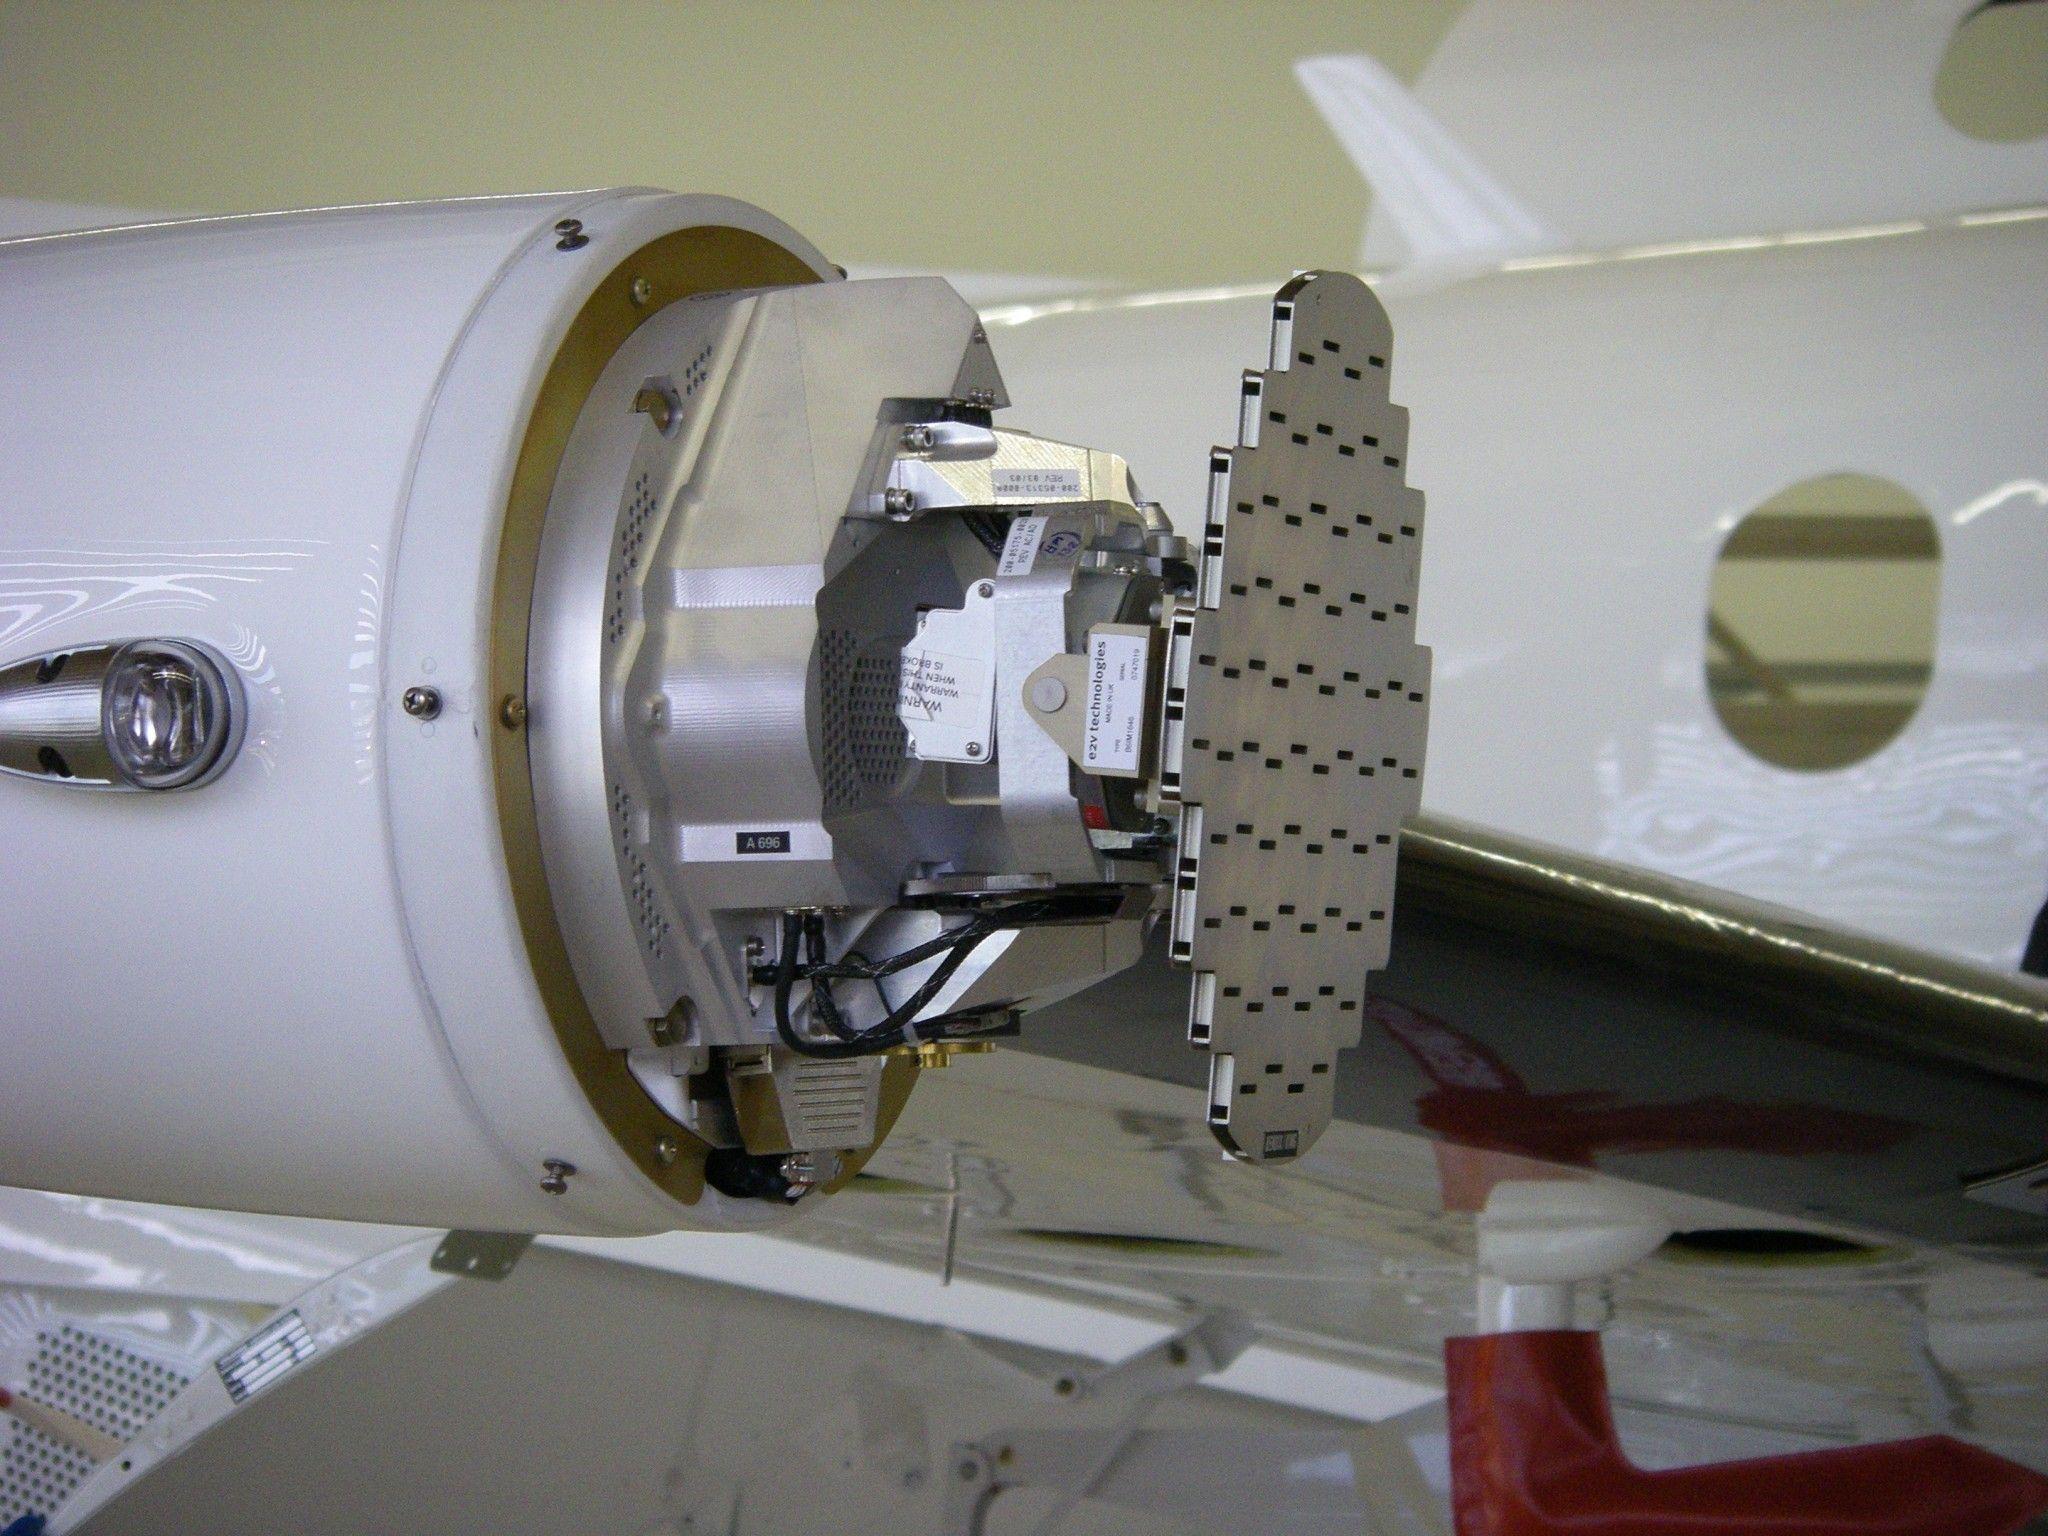 PC-12 RADAR Pod Exposed | Atmospheric dynamics | Kitchen aid